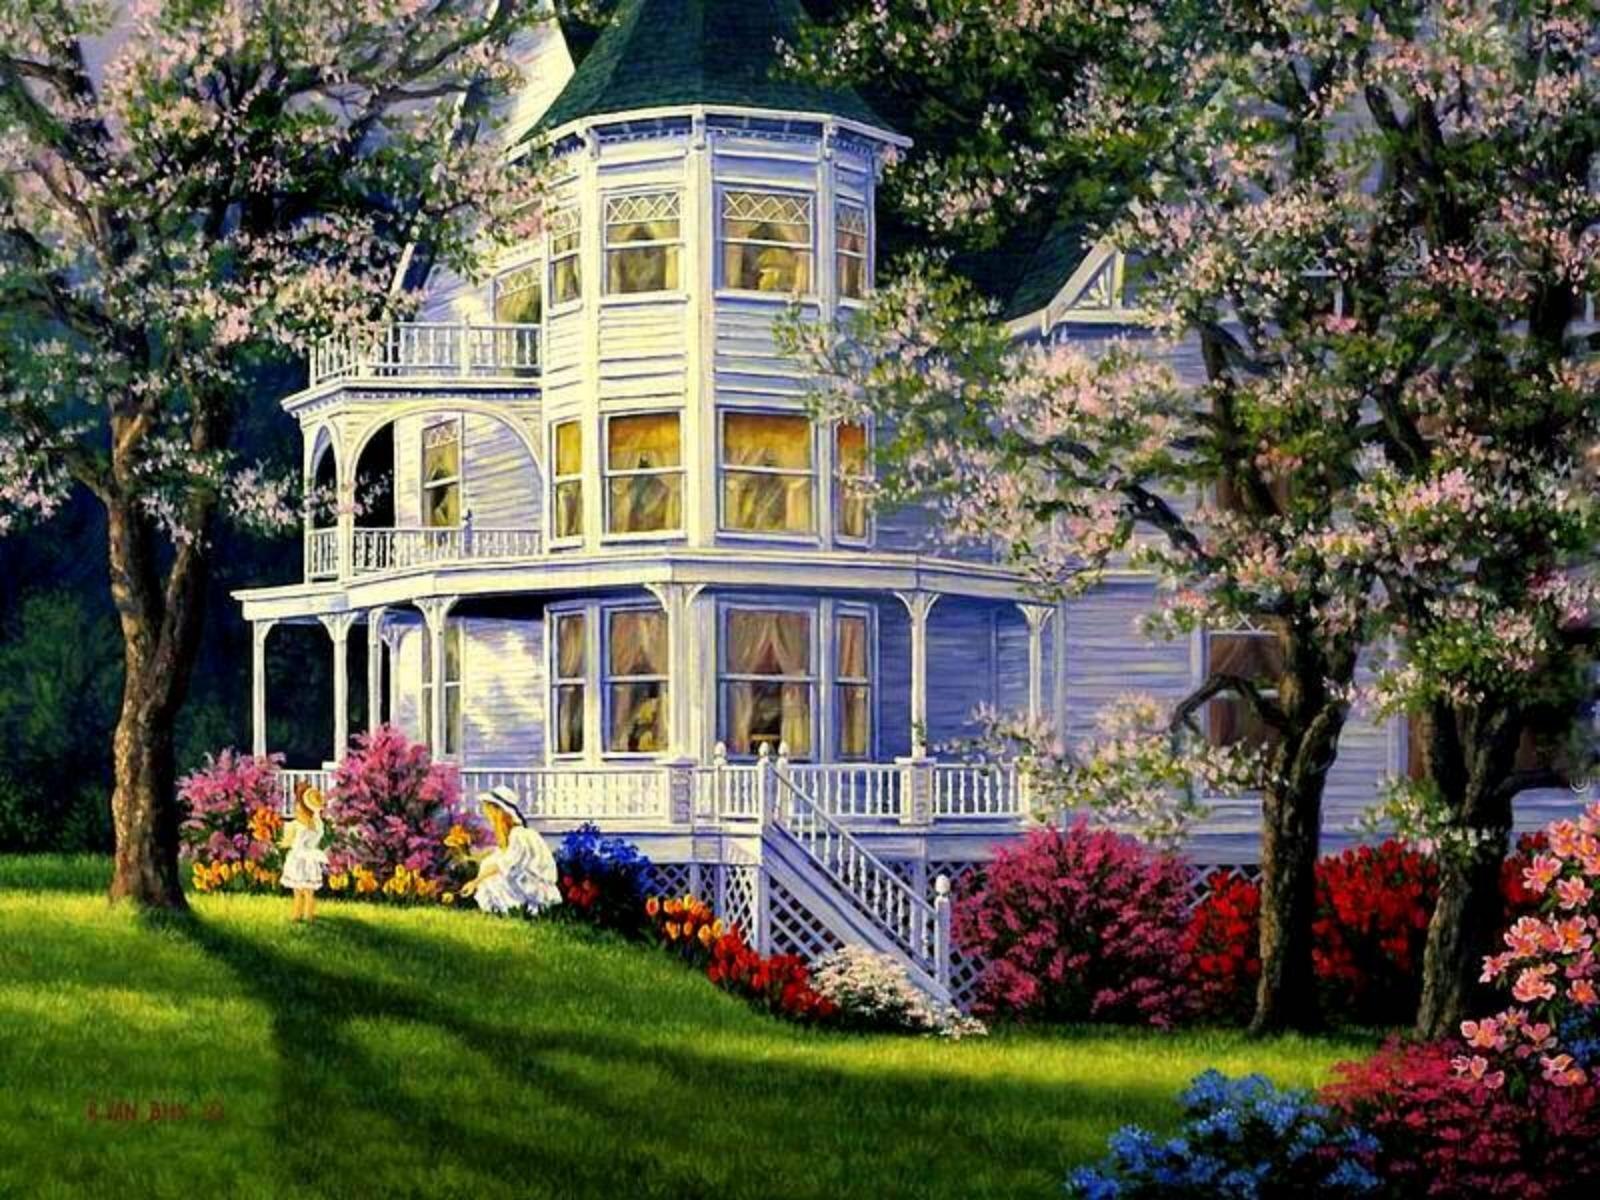 historic homes wallpaper wallpapersafari. Black Bedroom Furniture Sets. Home Design Ideas